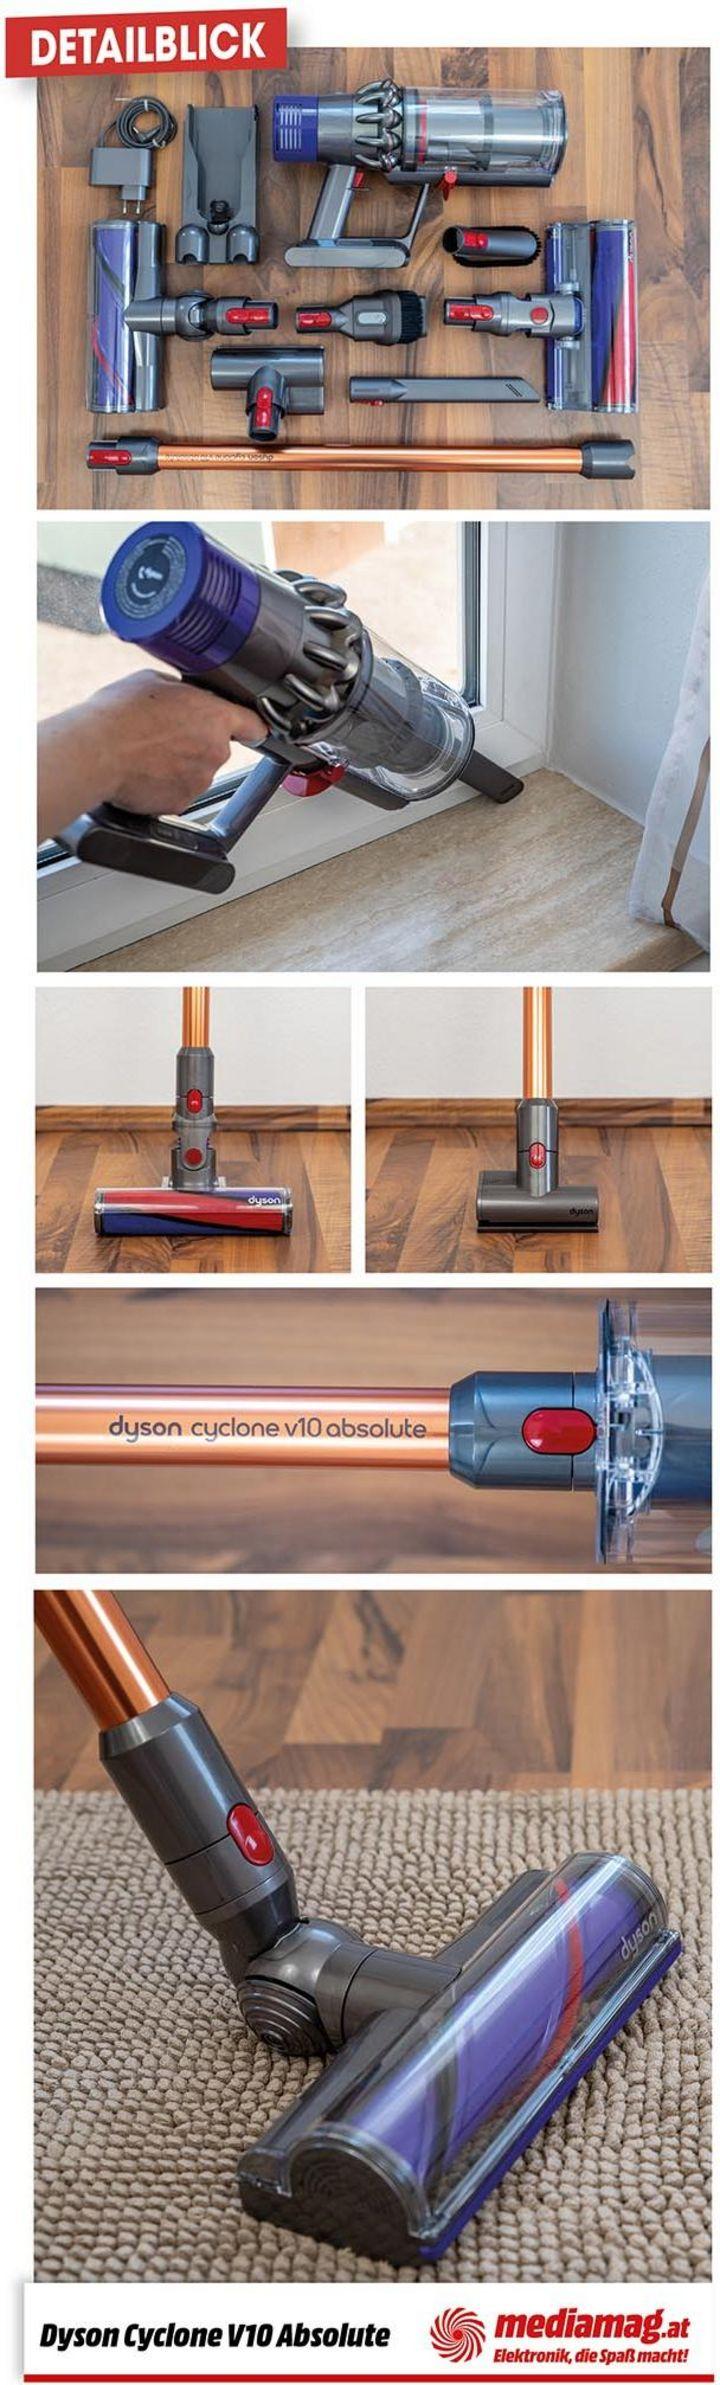 detailblick der dyson cyclone v10 absolute der akku. Black Bedroom Furniture Sets. Home Design Ideas